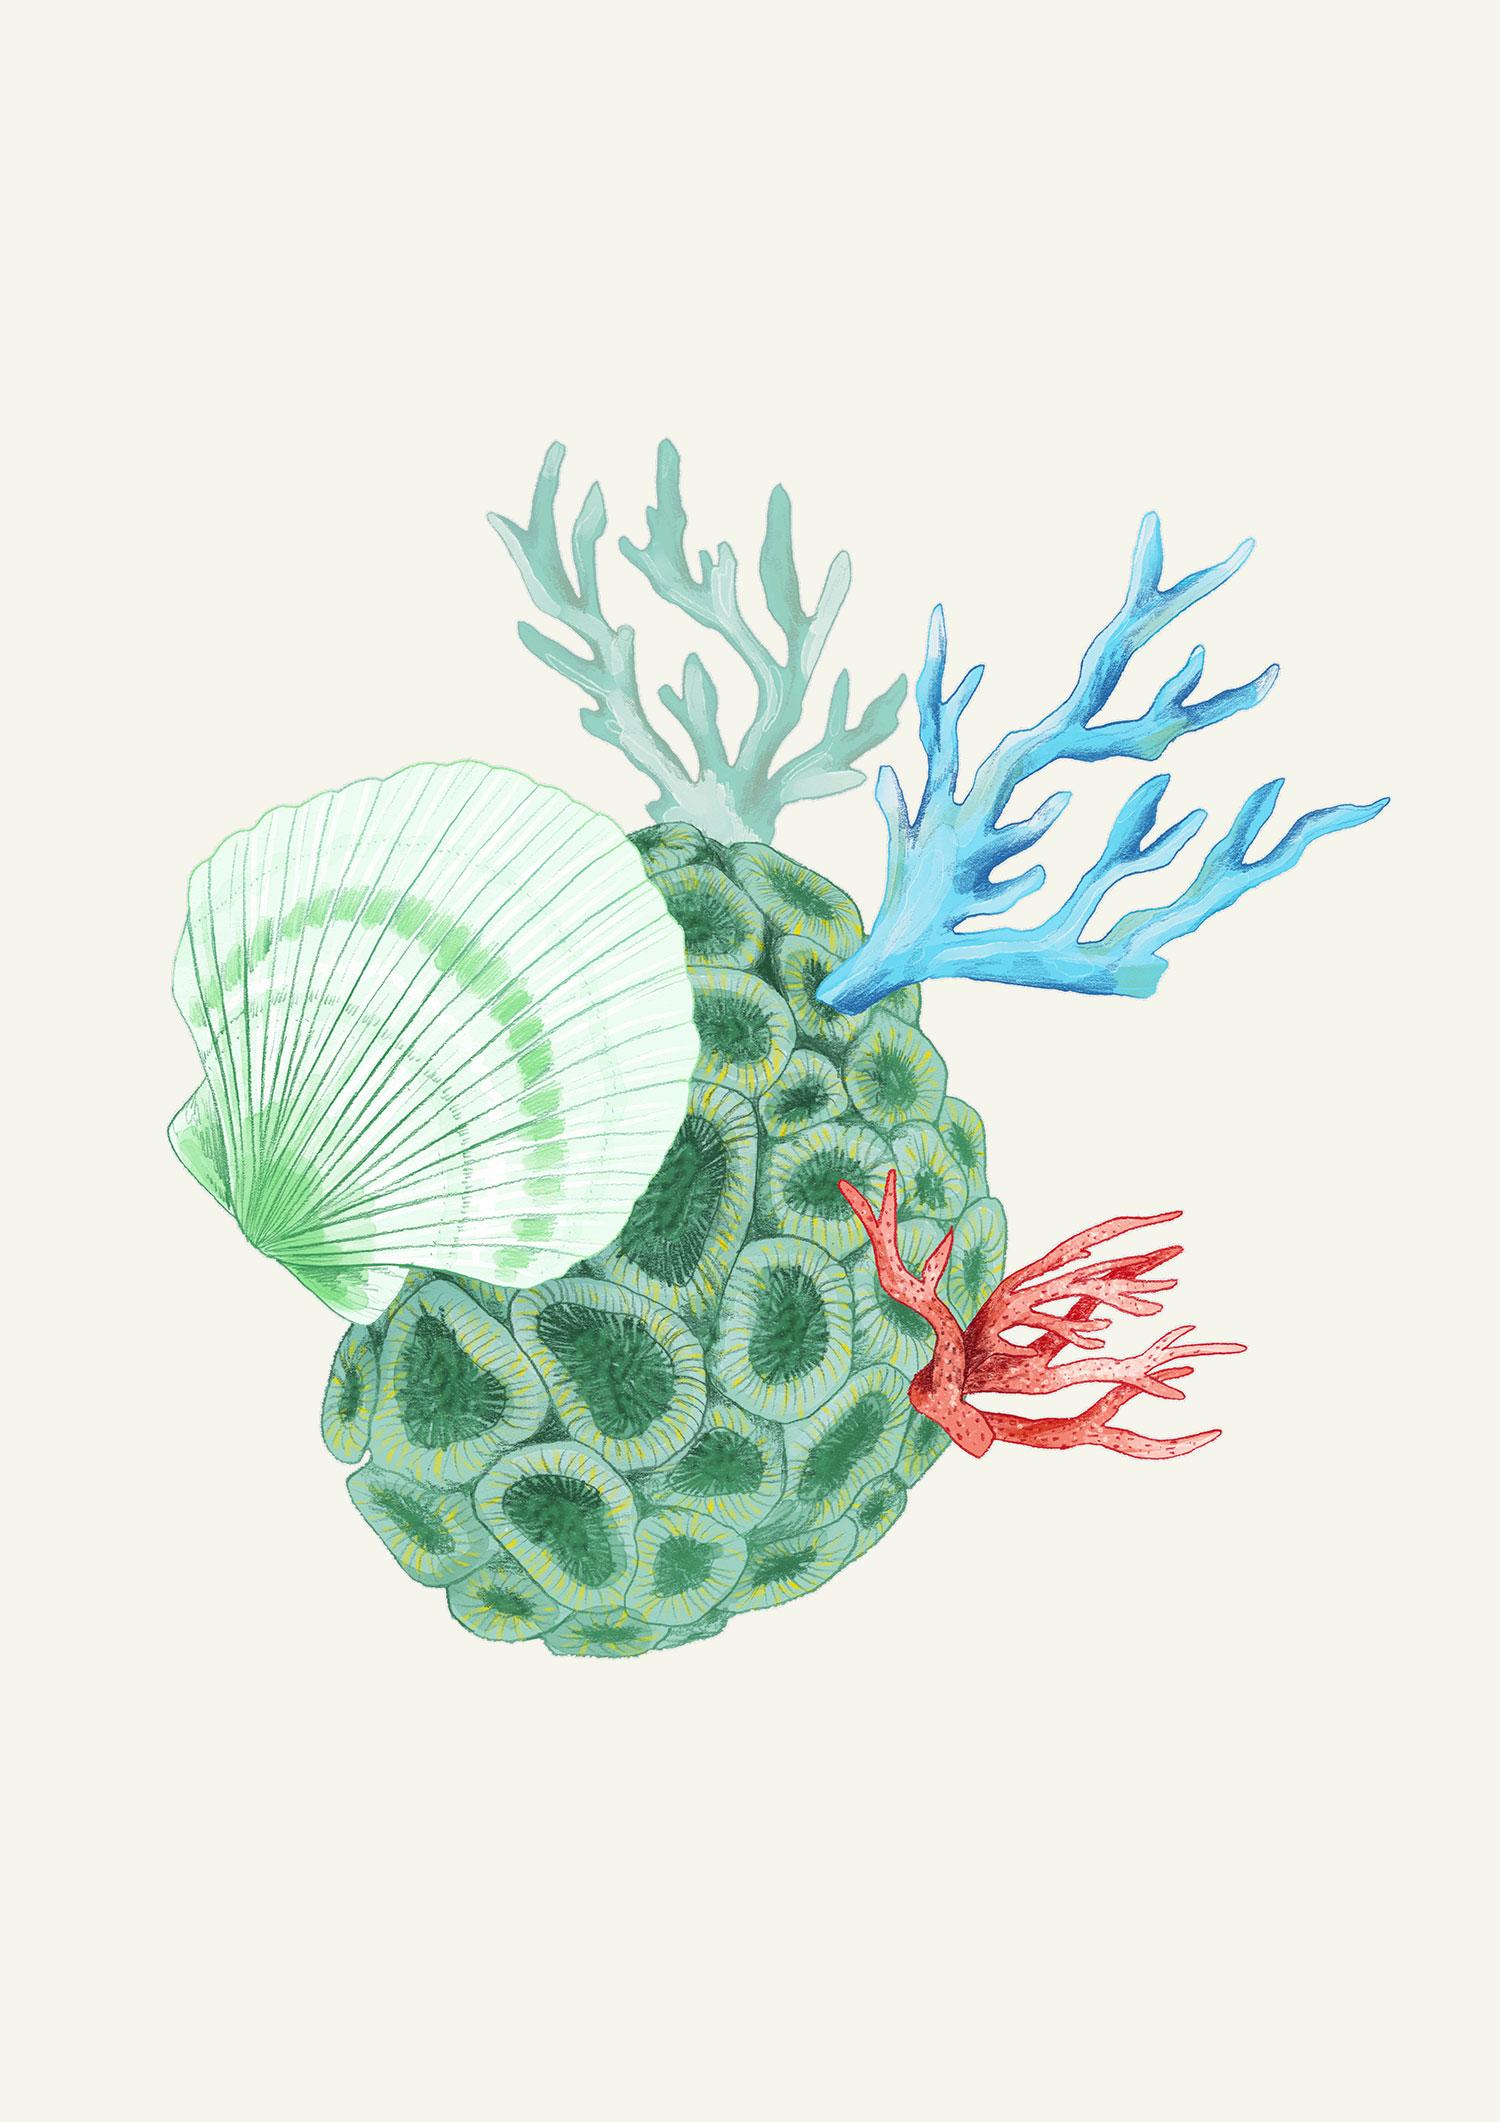 fig. 2. Coral element illustrations